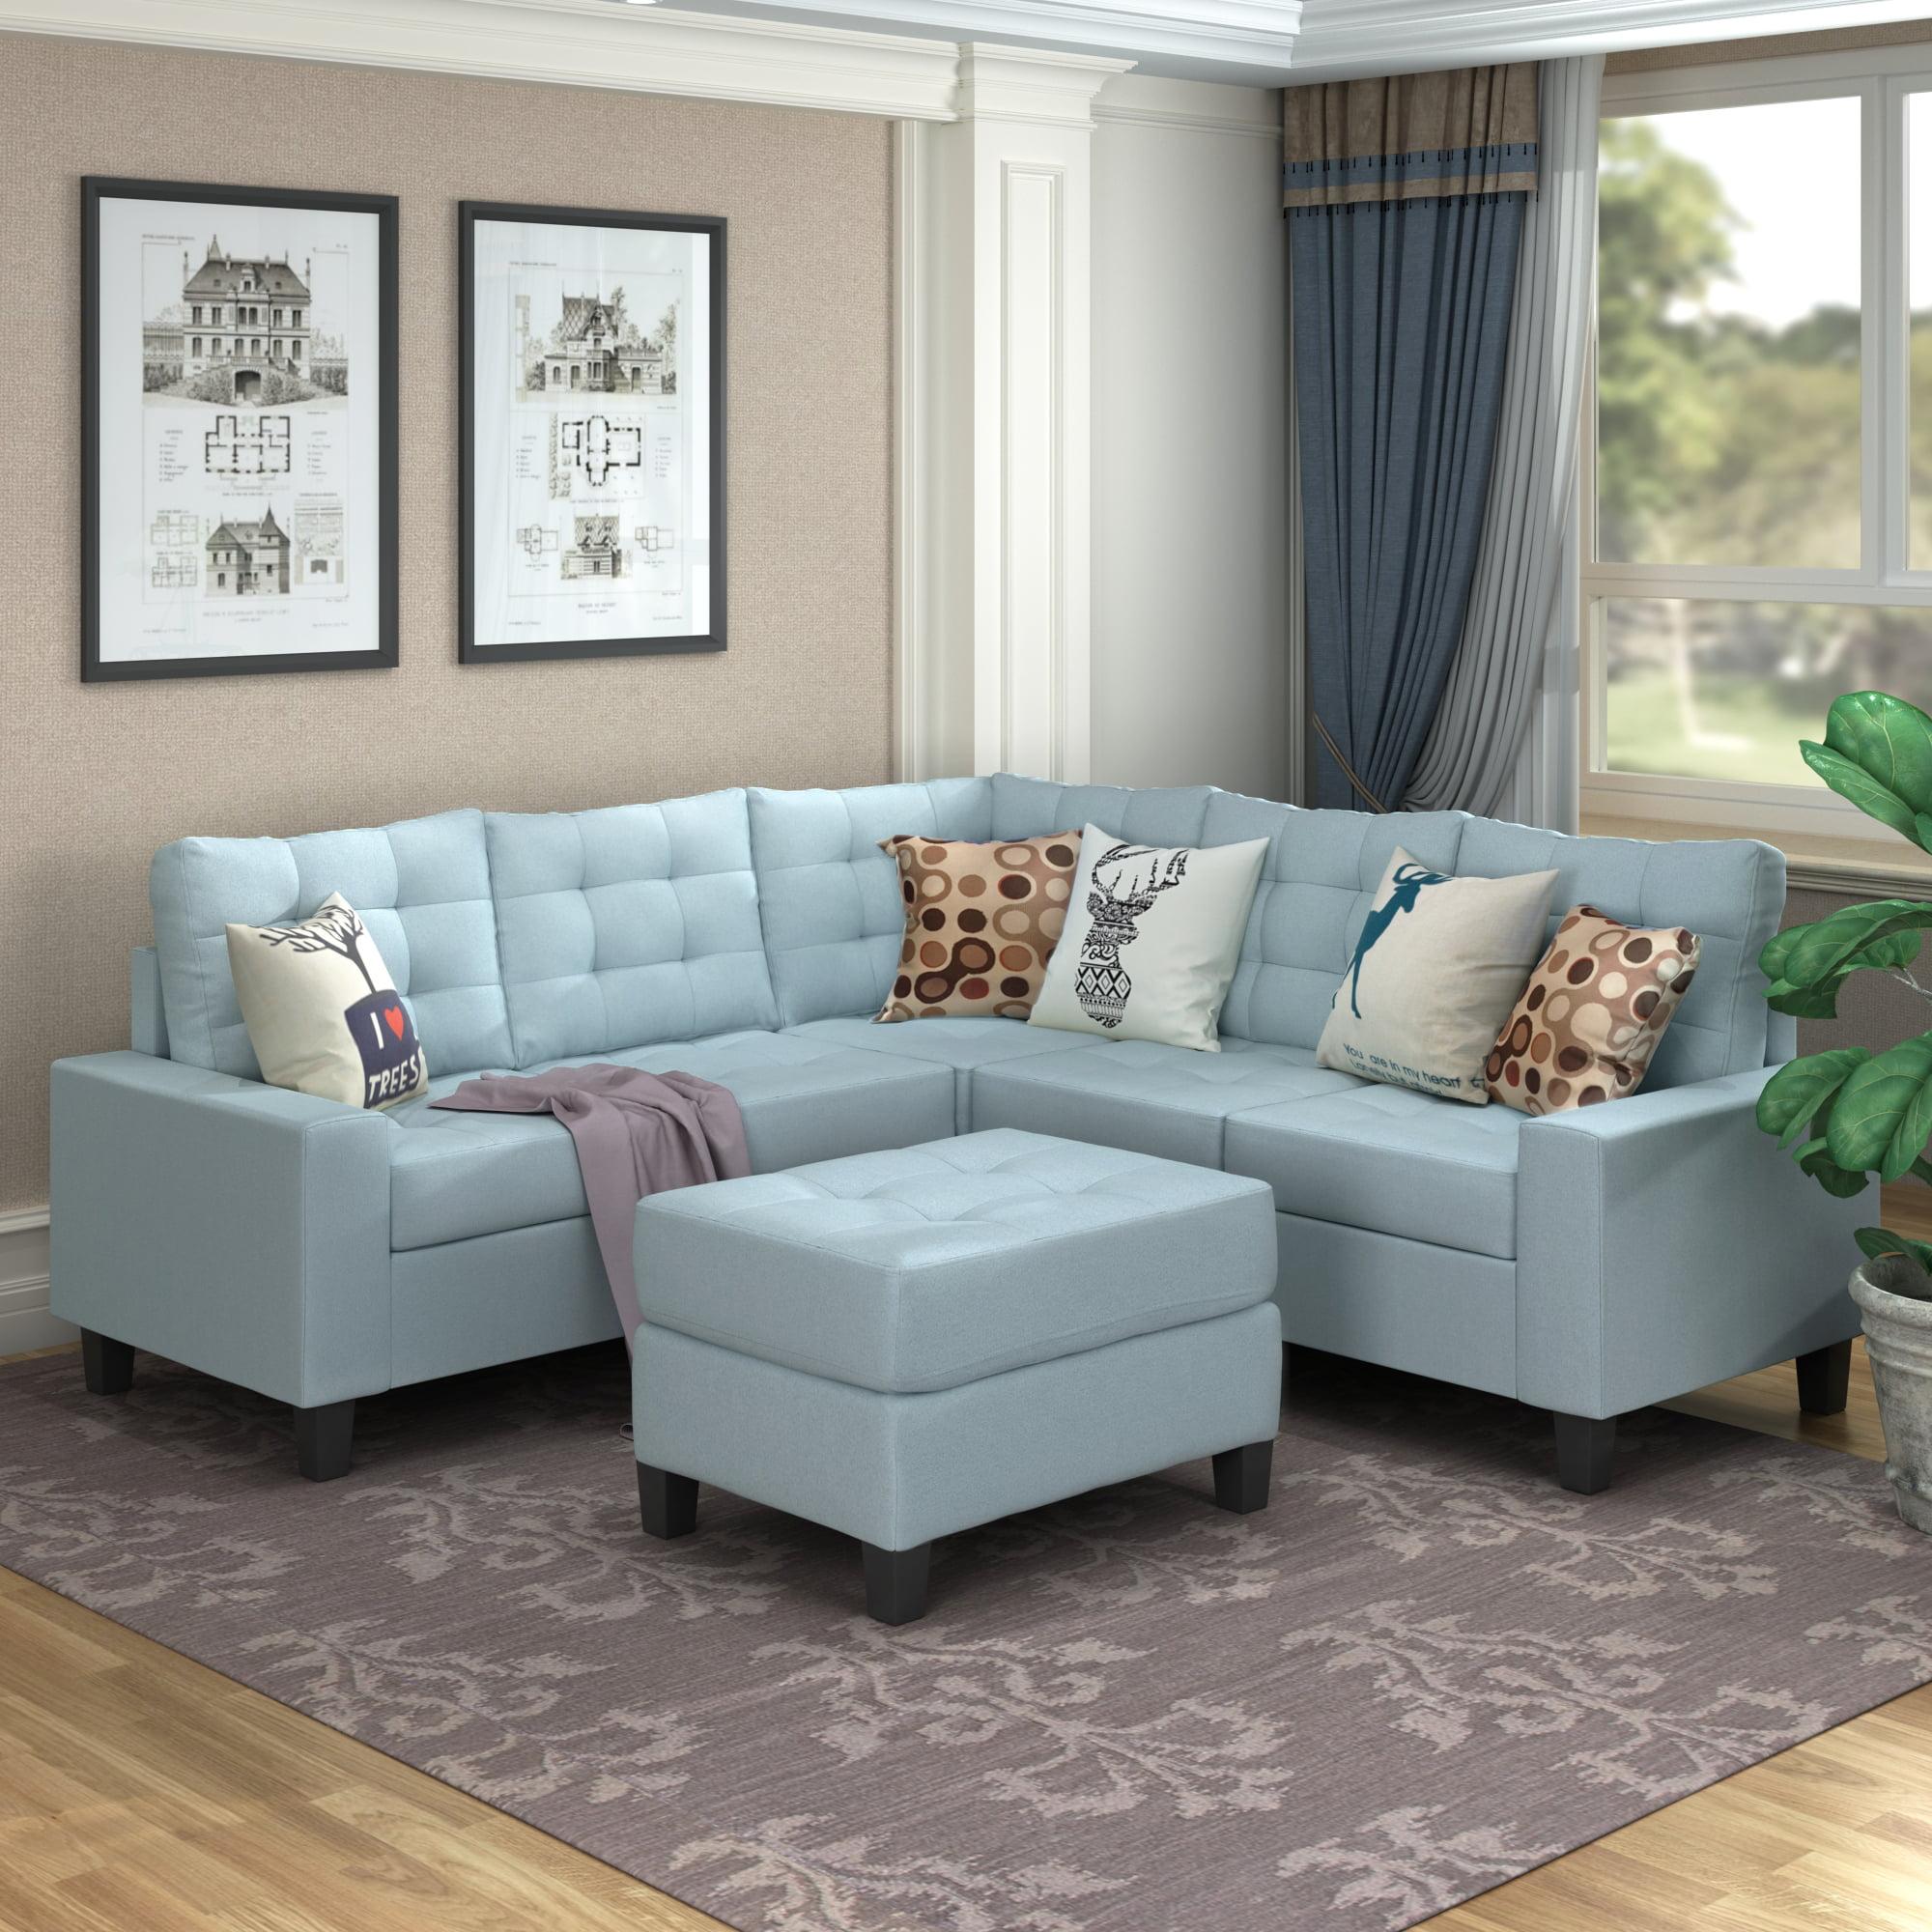 Living Room Furniture Sectional Sofa